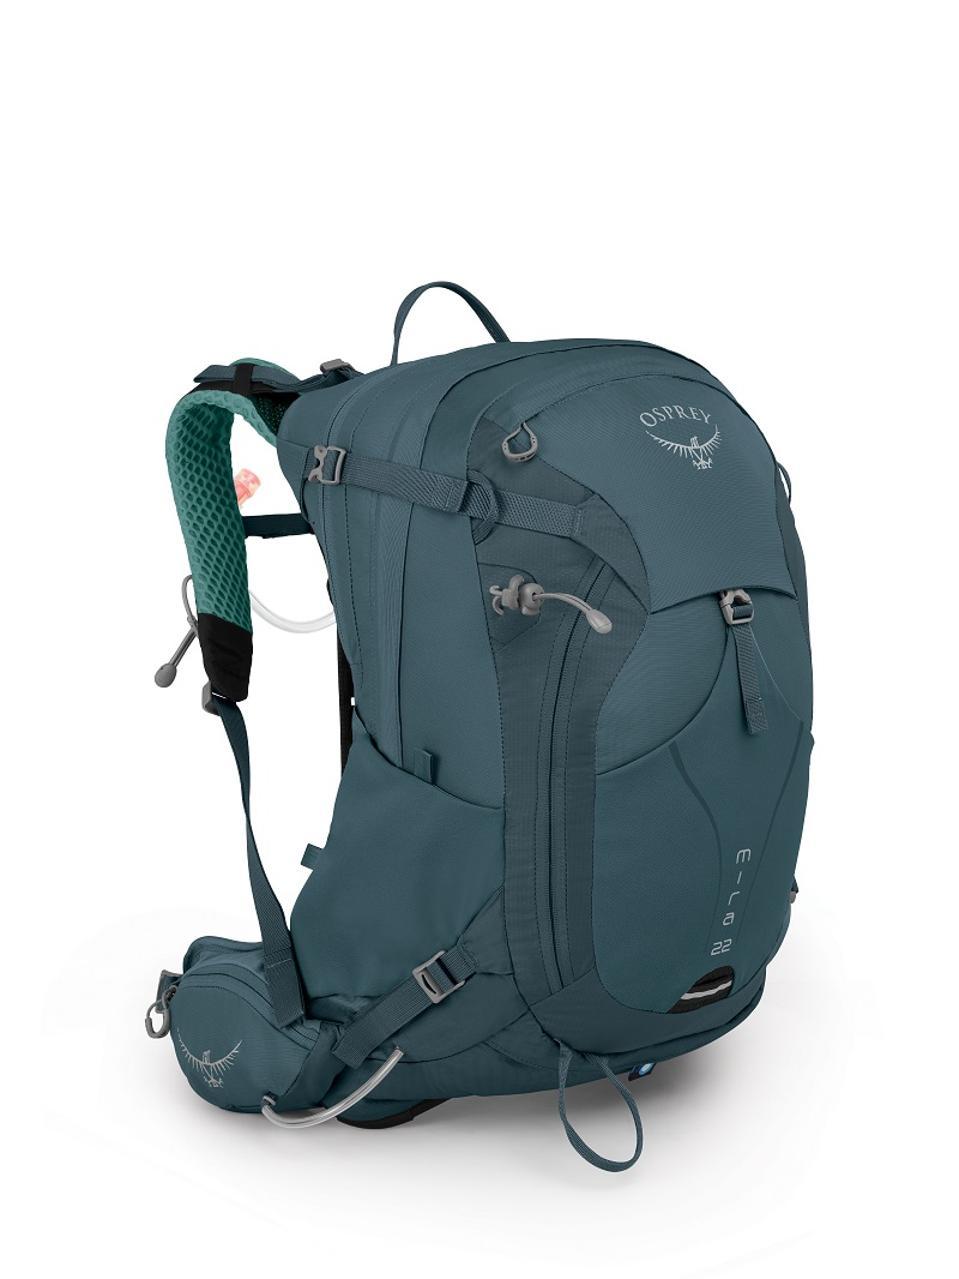 Osprey women's backpack